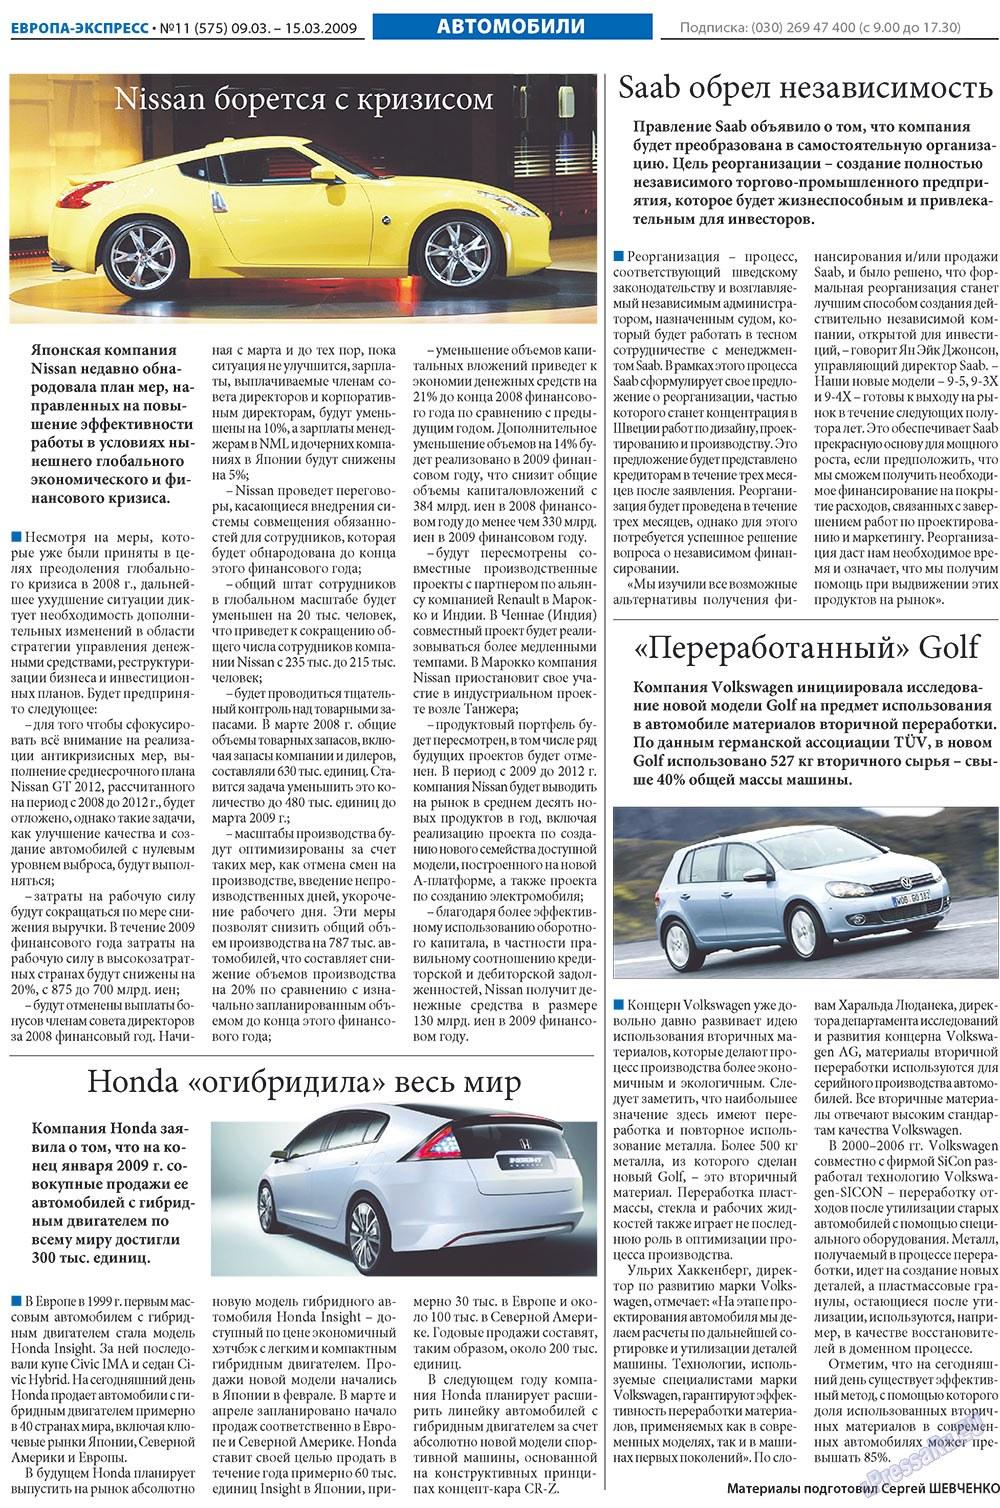 Европа экспресс (газета). 2009 год, номер 11, стр. 18